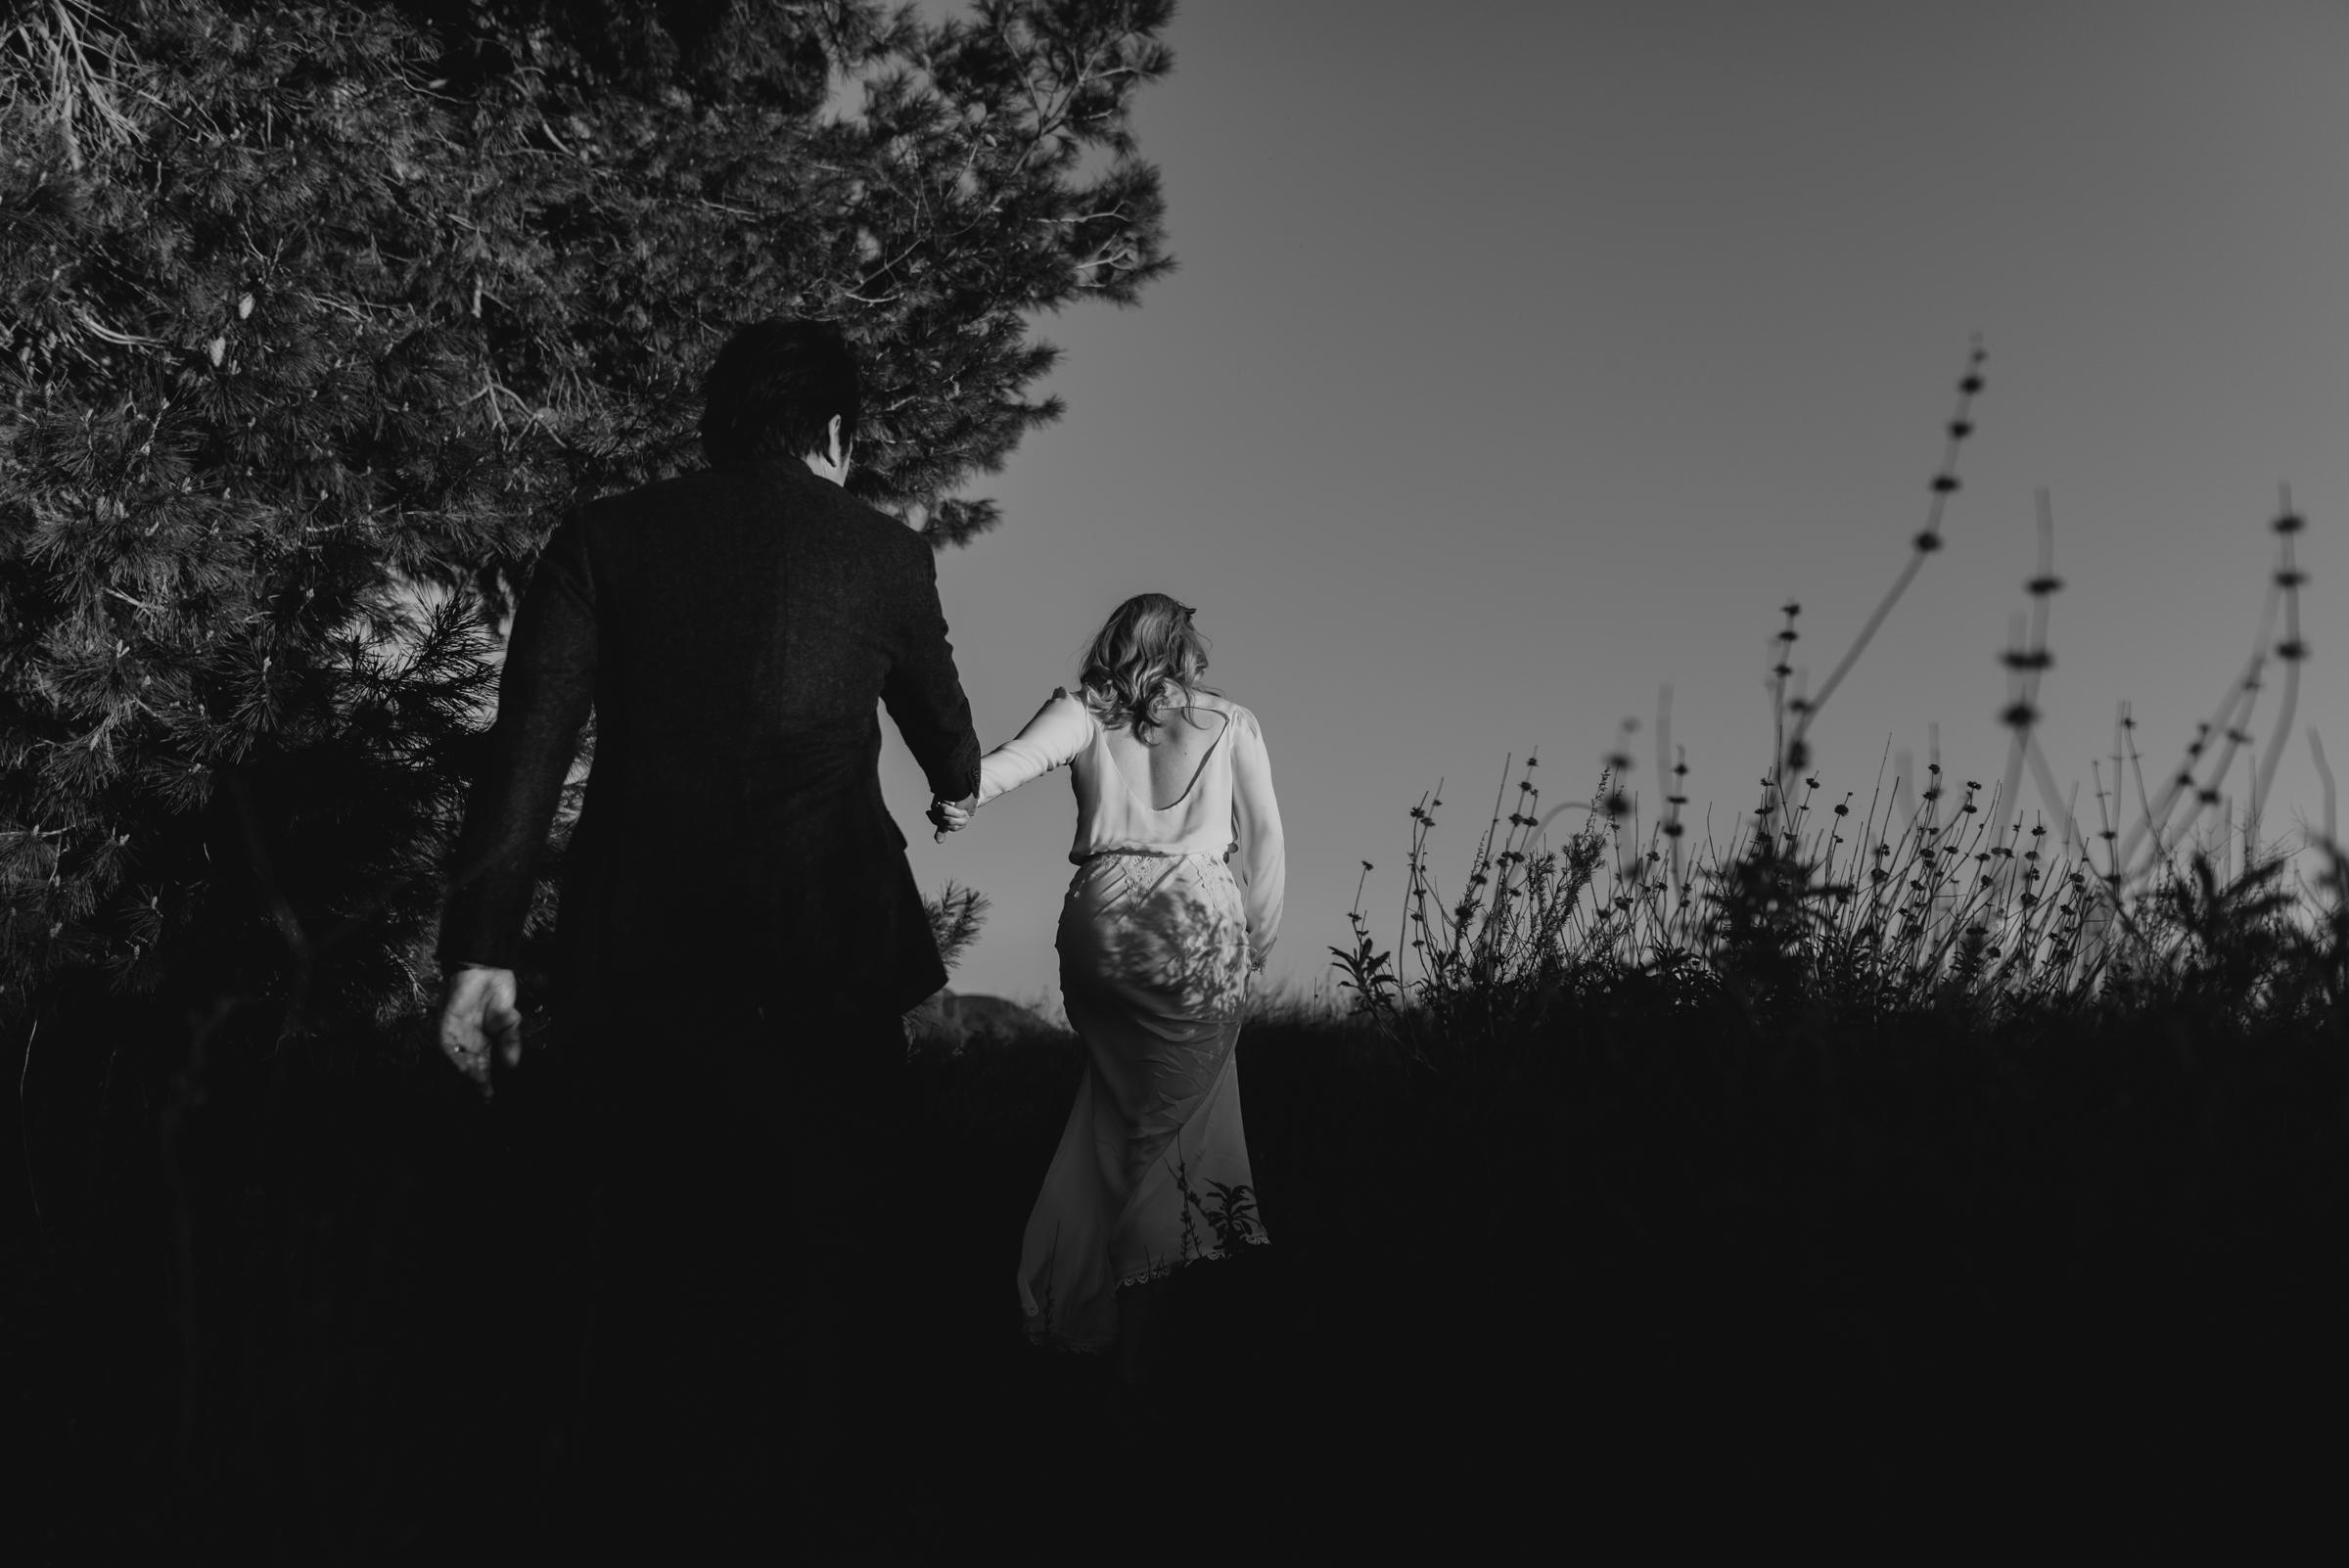 ©Isaiah + Taylor Photography - Intimate Elopement, Eaton Canyon, Los Angeles Wedding Photographer-76.jpg